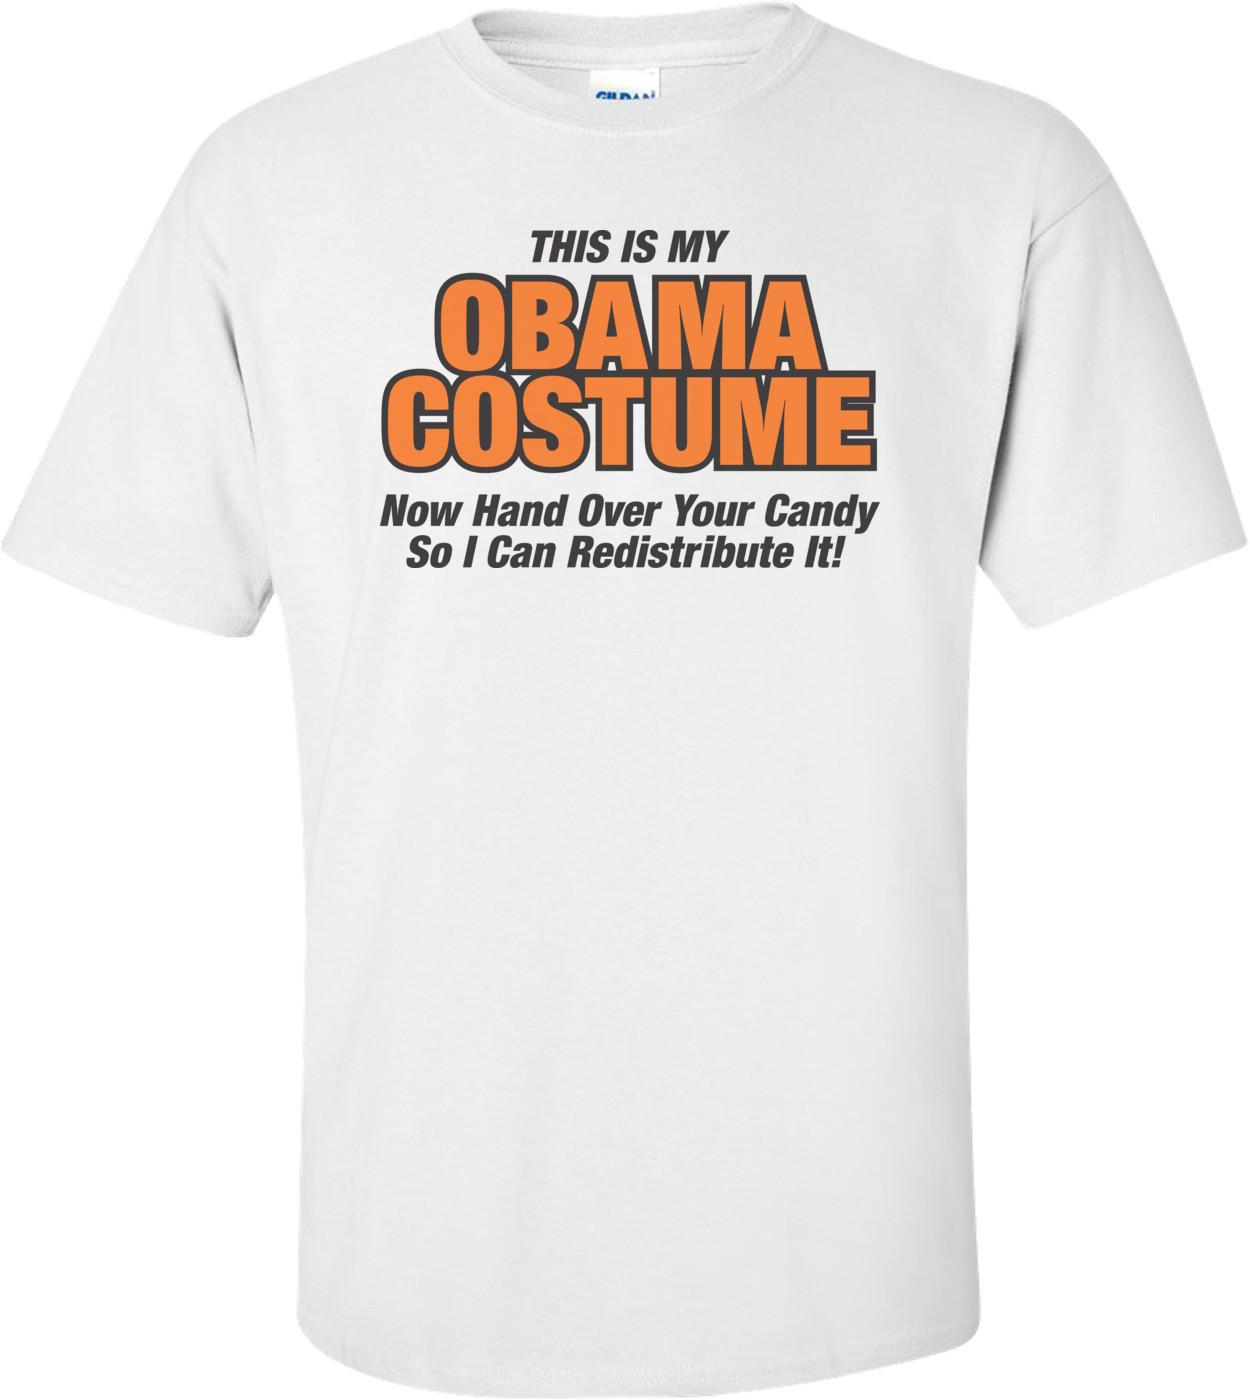 This Is My Obama Costume Anti Obama Halloween T-shirt